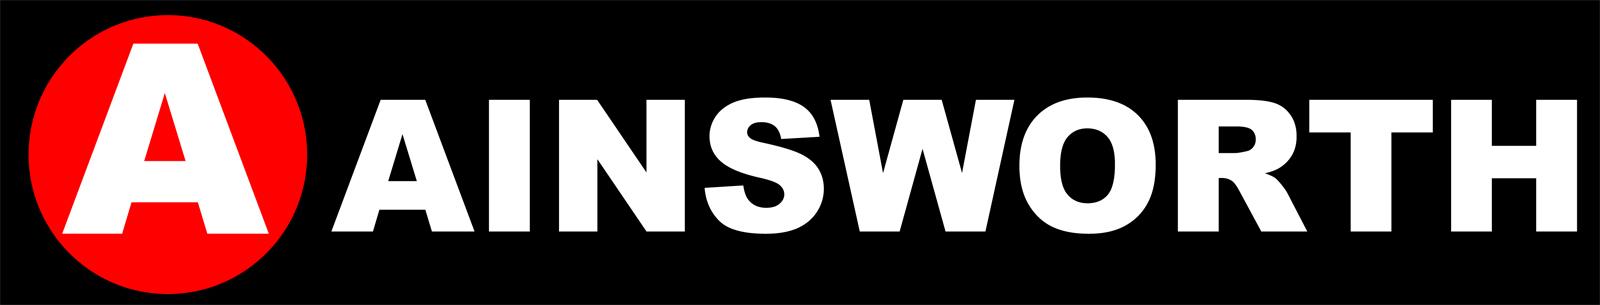 Ainsworth-Sign